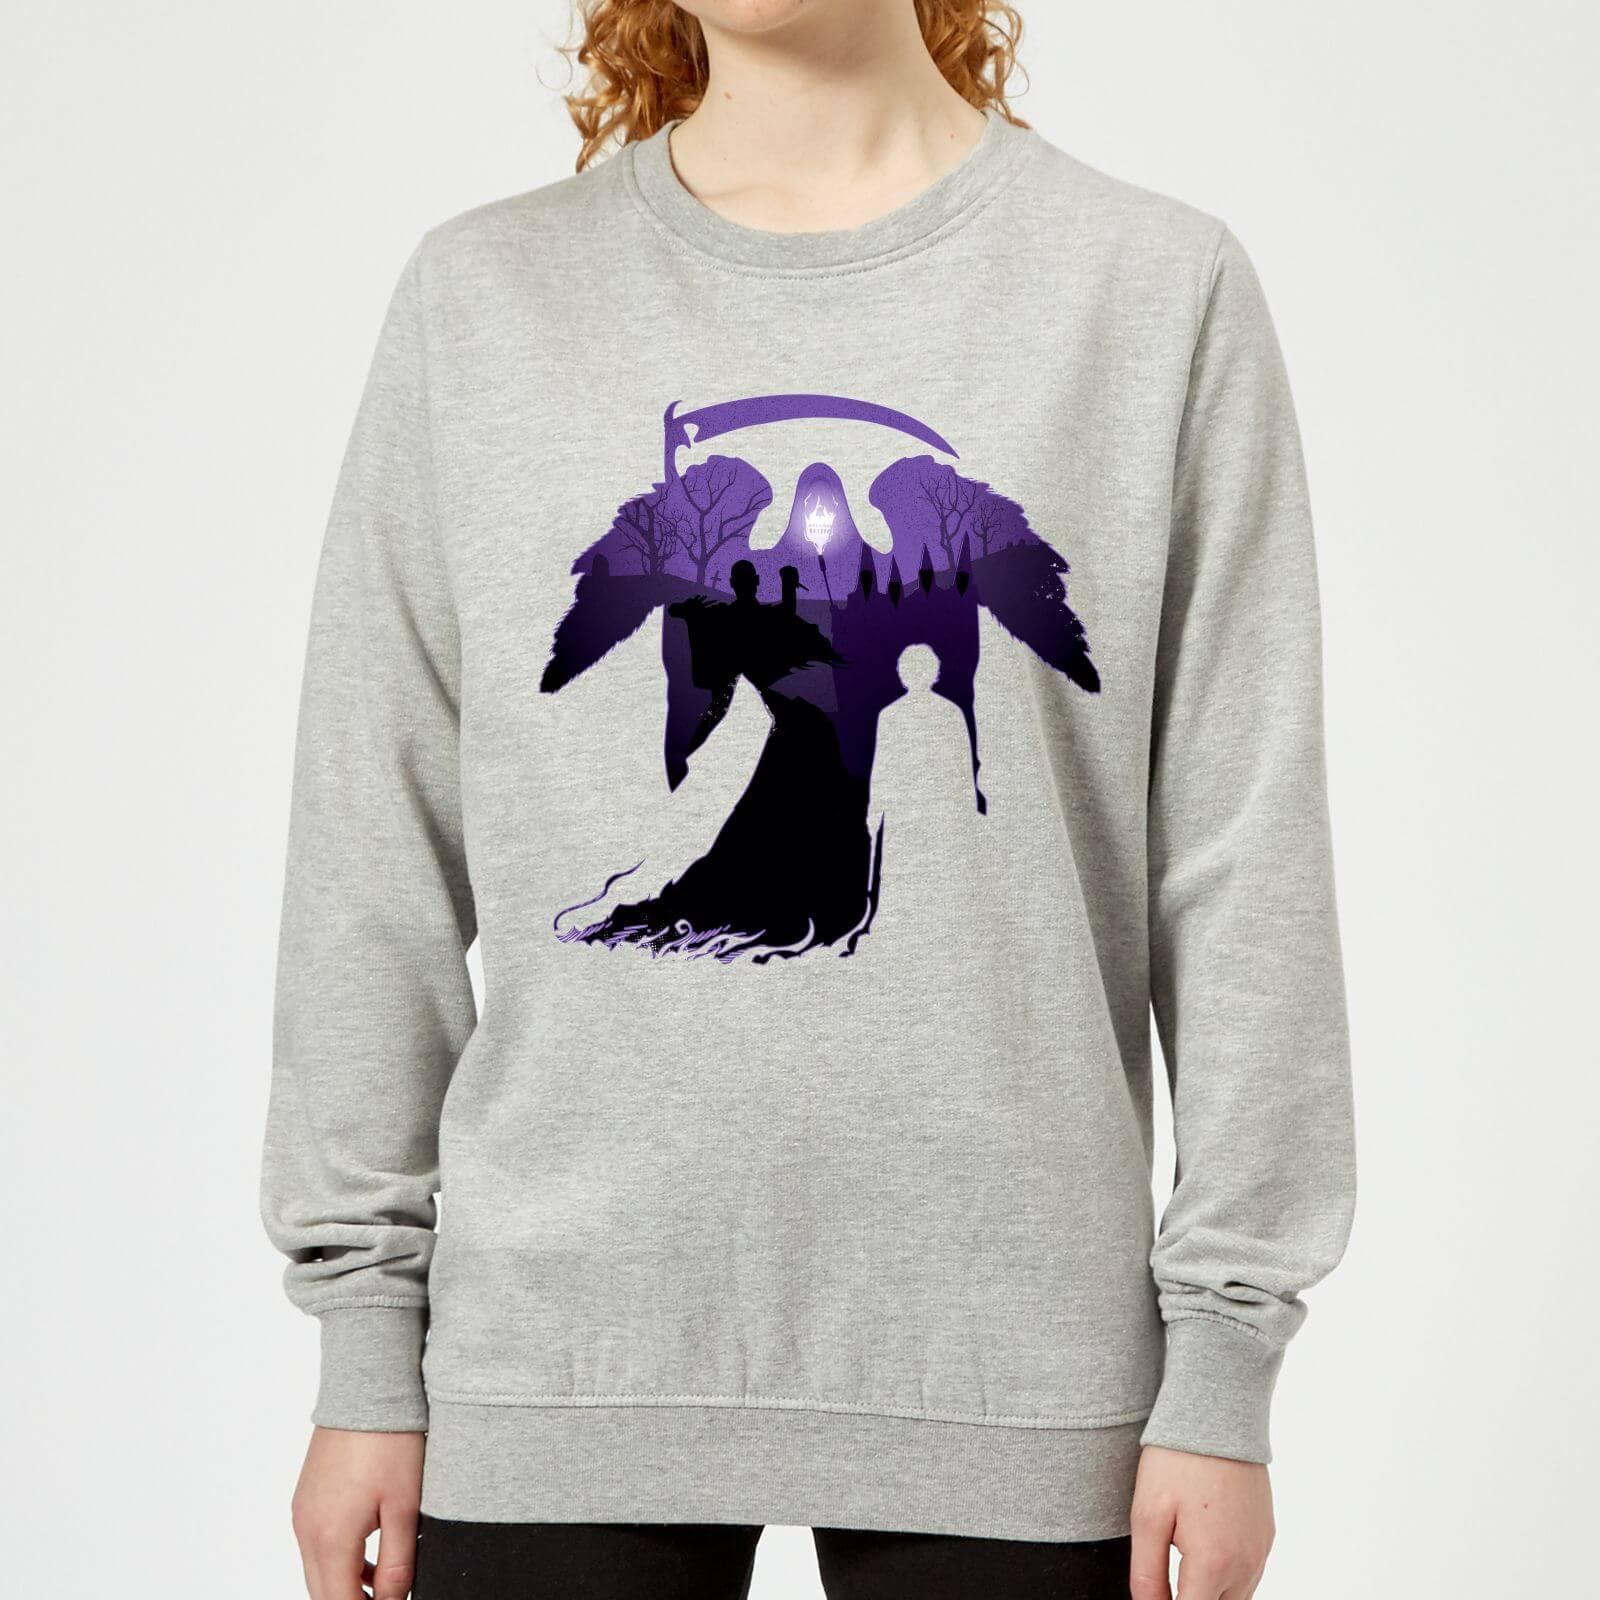 detailed look 62c11 8e50f Harry Potter Graveyard Silhouette Damen Pullover - Grau